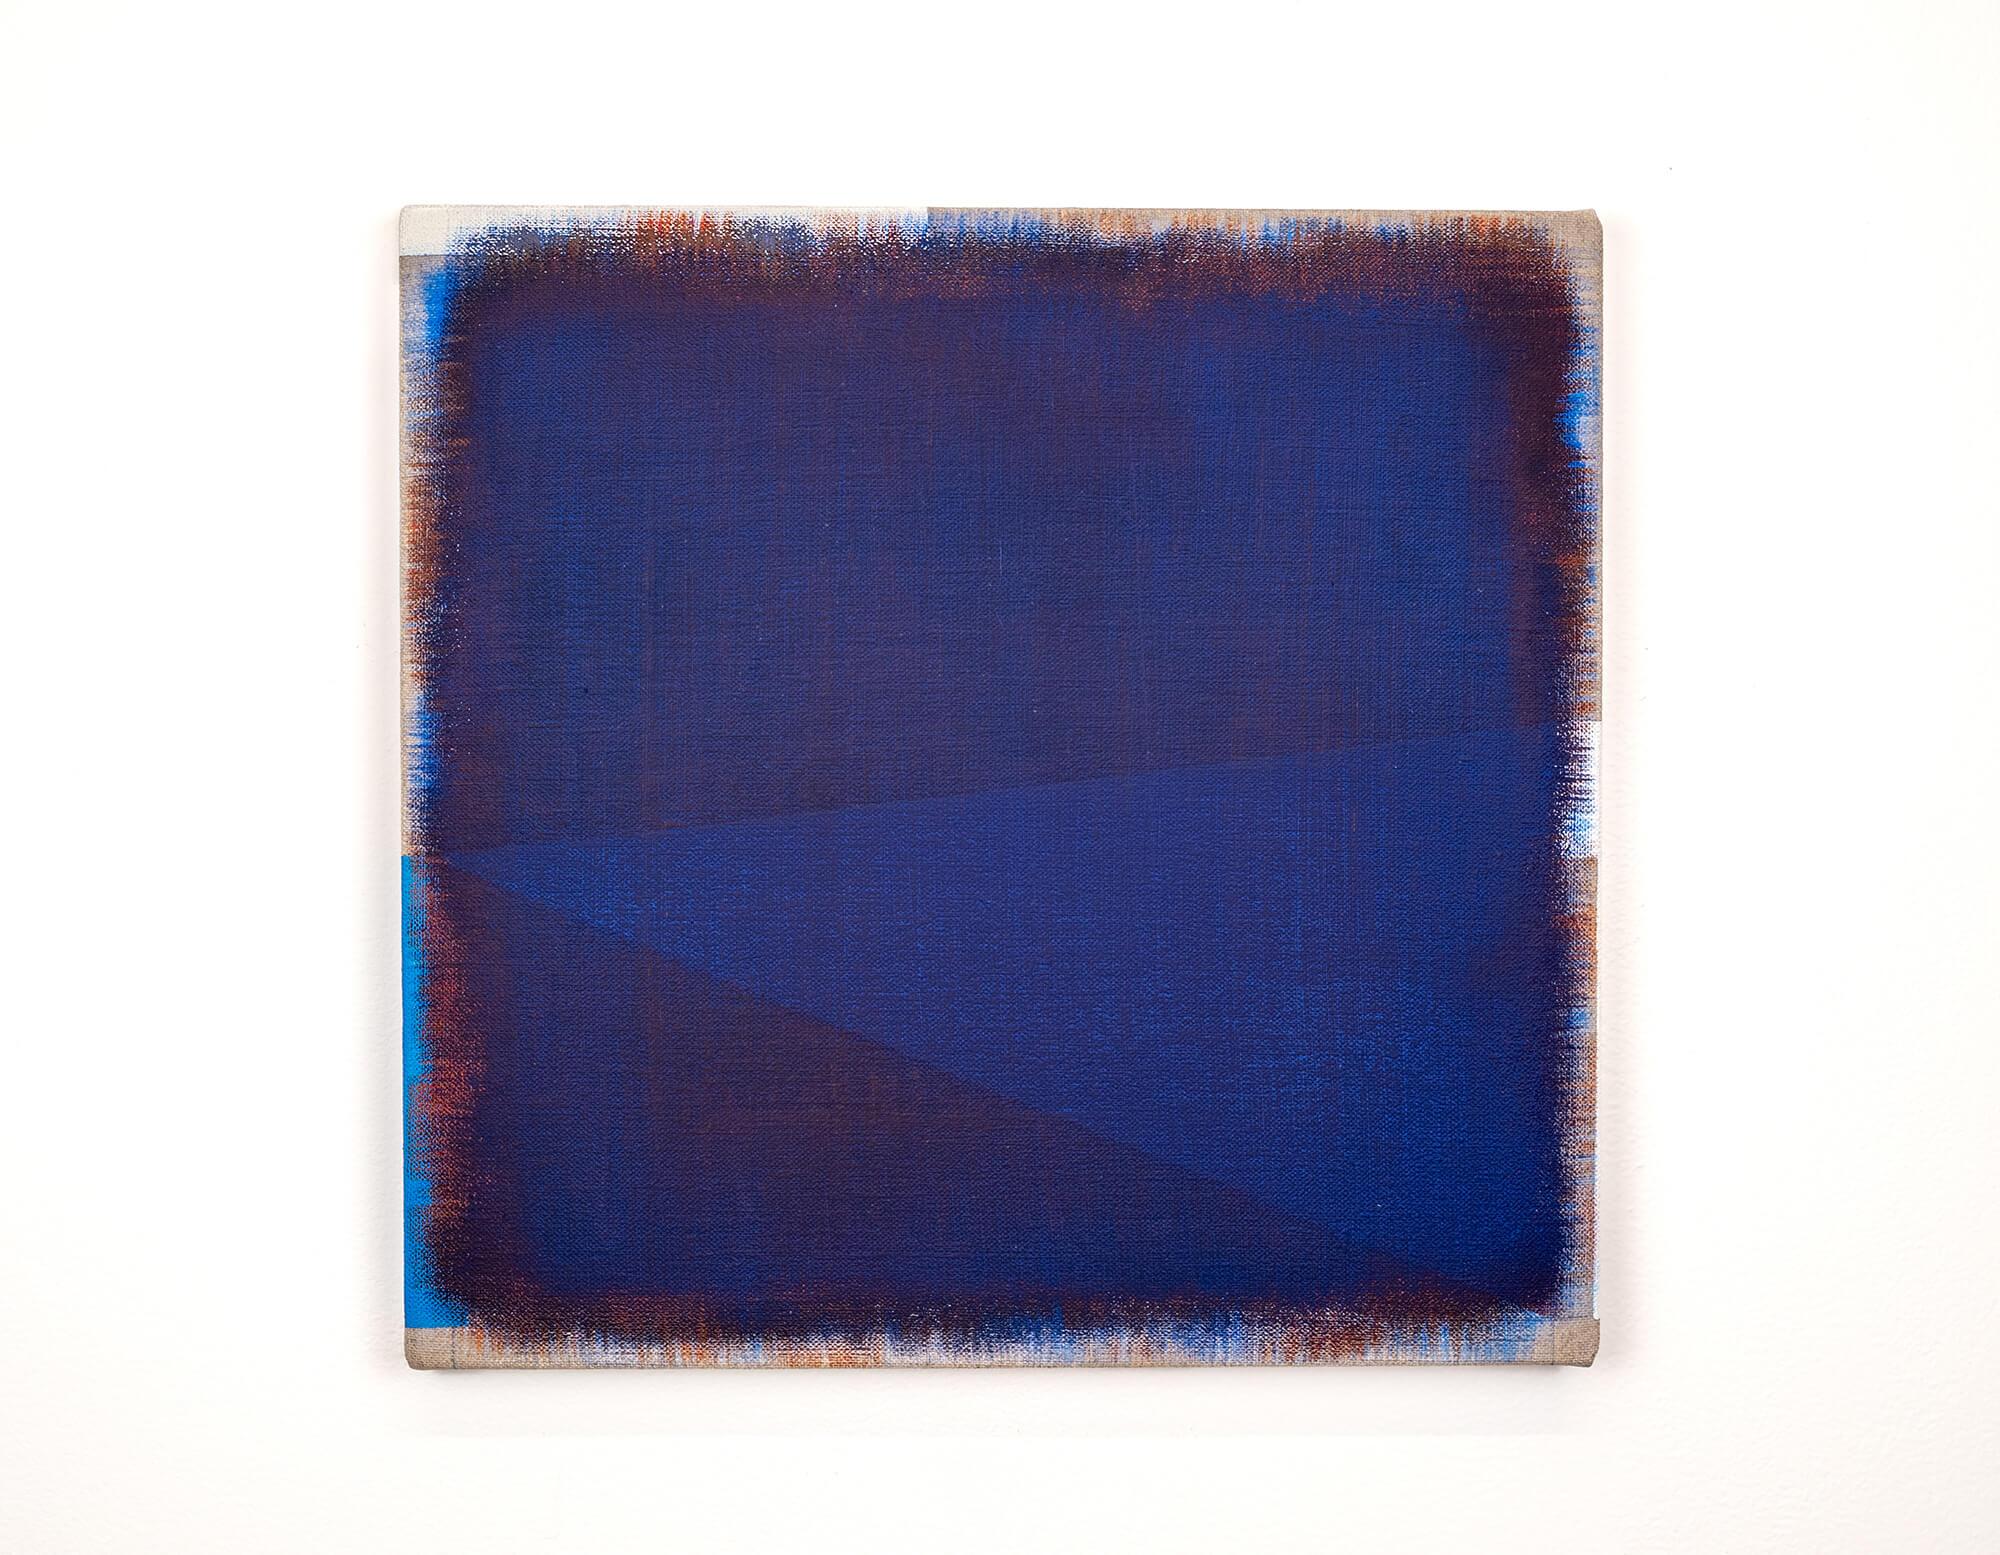 Randy Gibson : Rational Wedge 81:64 (Blue)